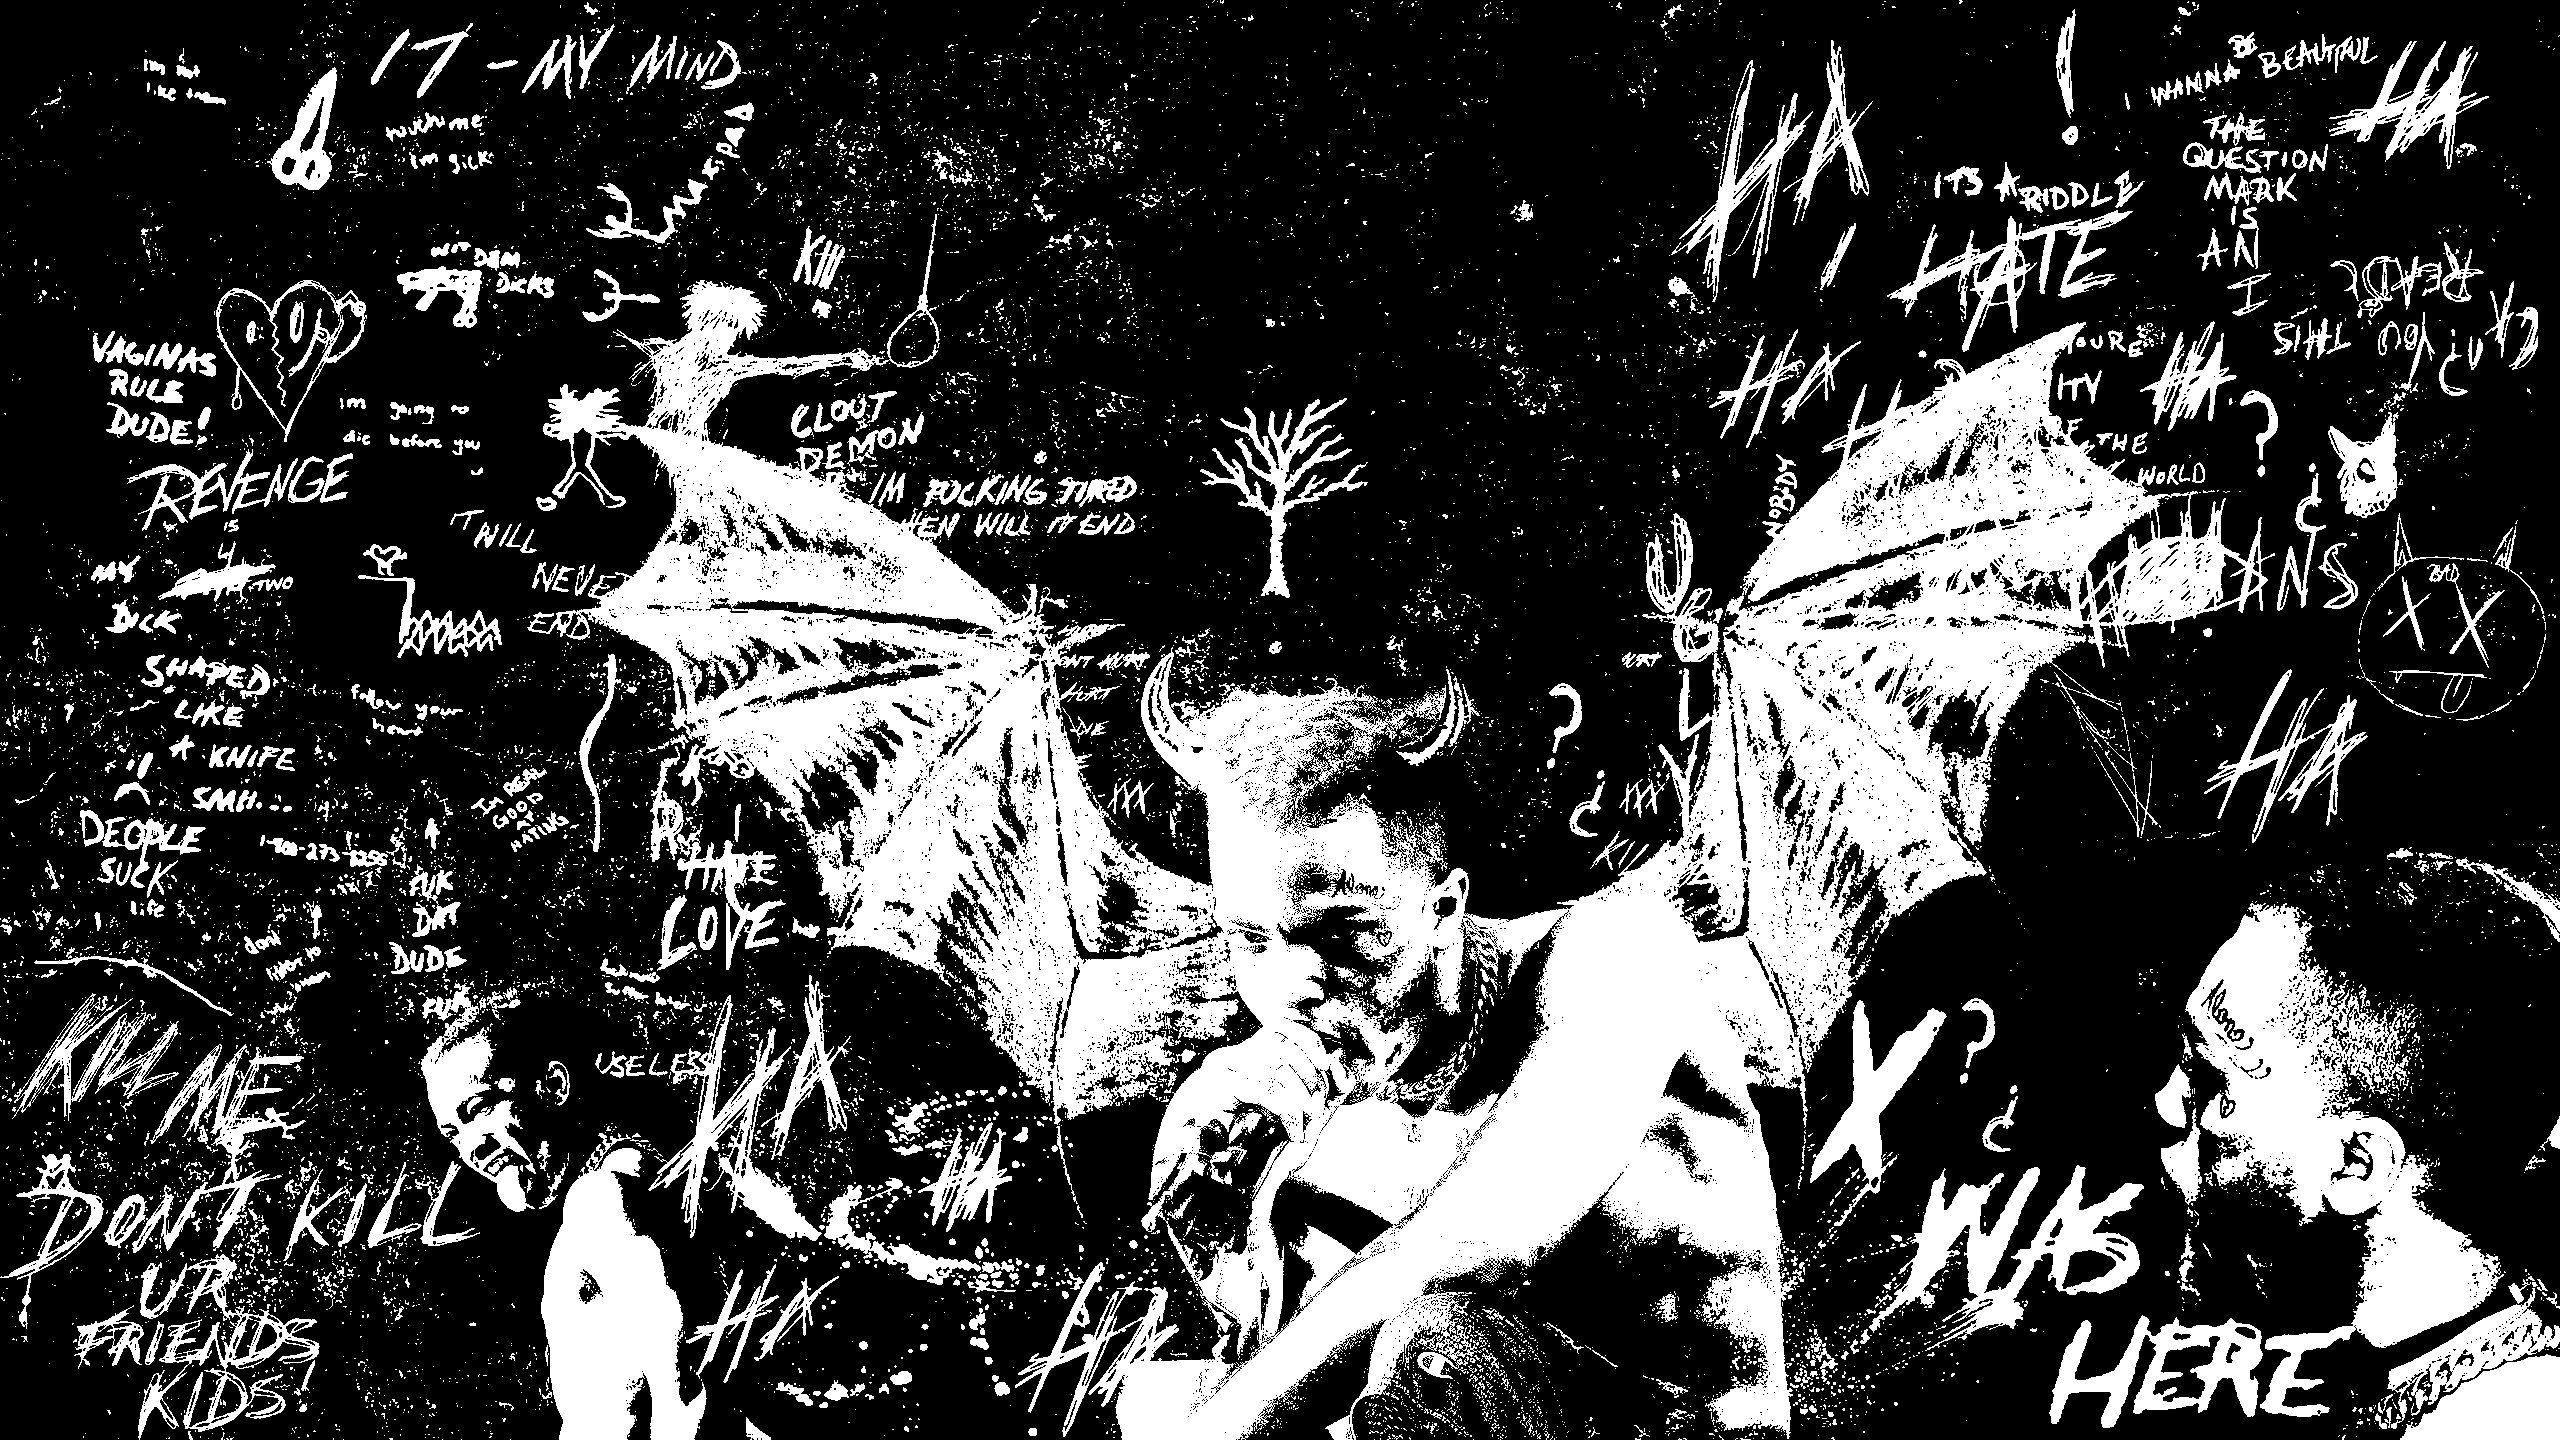 2560x1440 xxxtentacion wallpaper from reddit   Album on Imgur 2560x1440